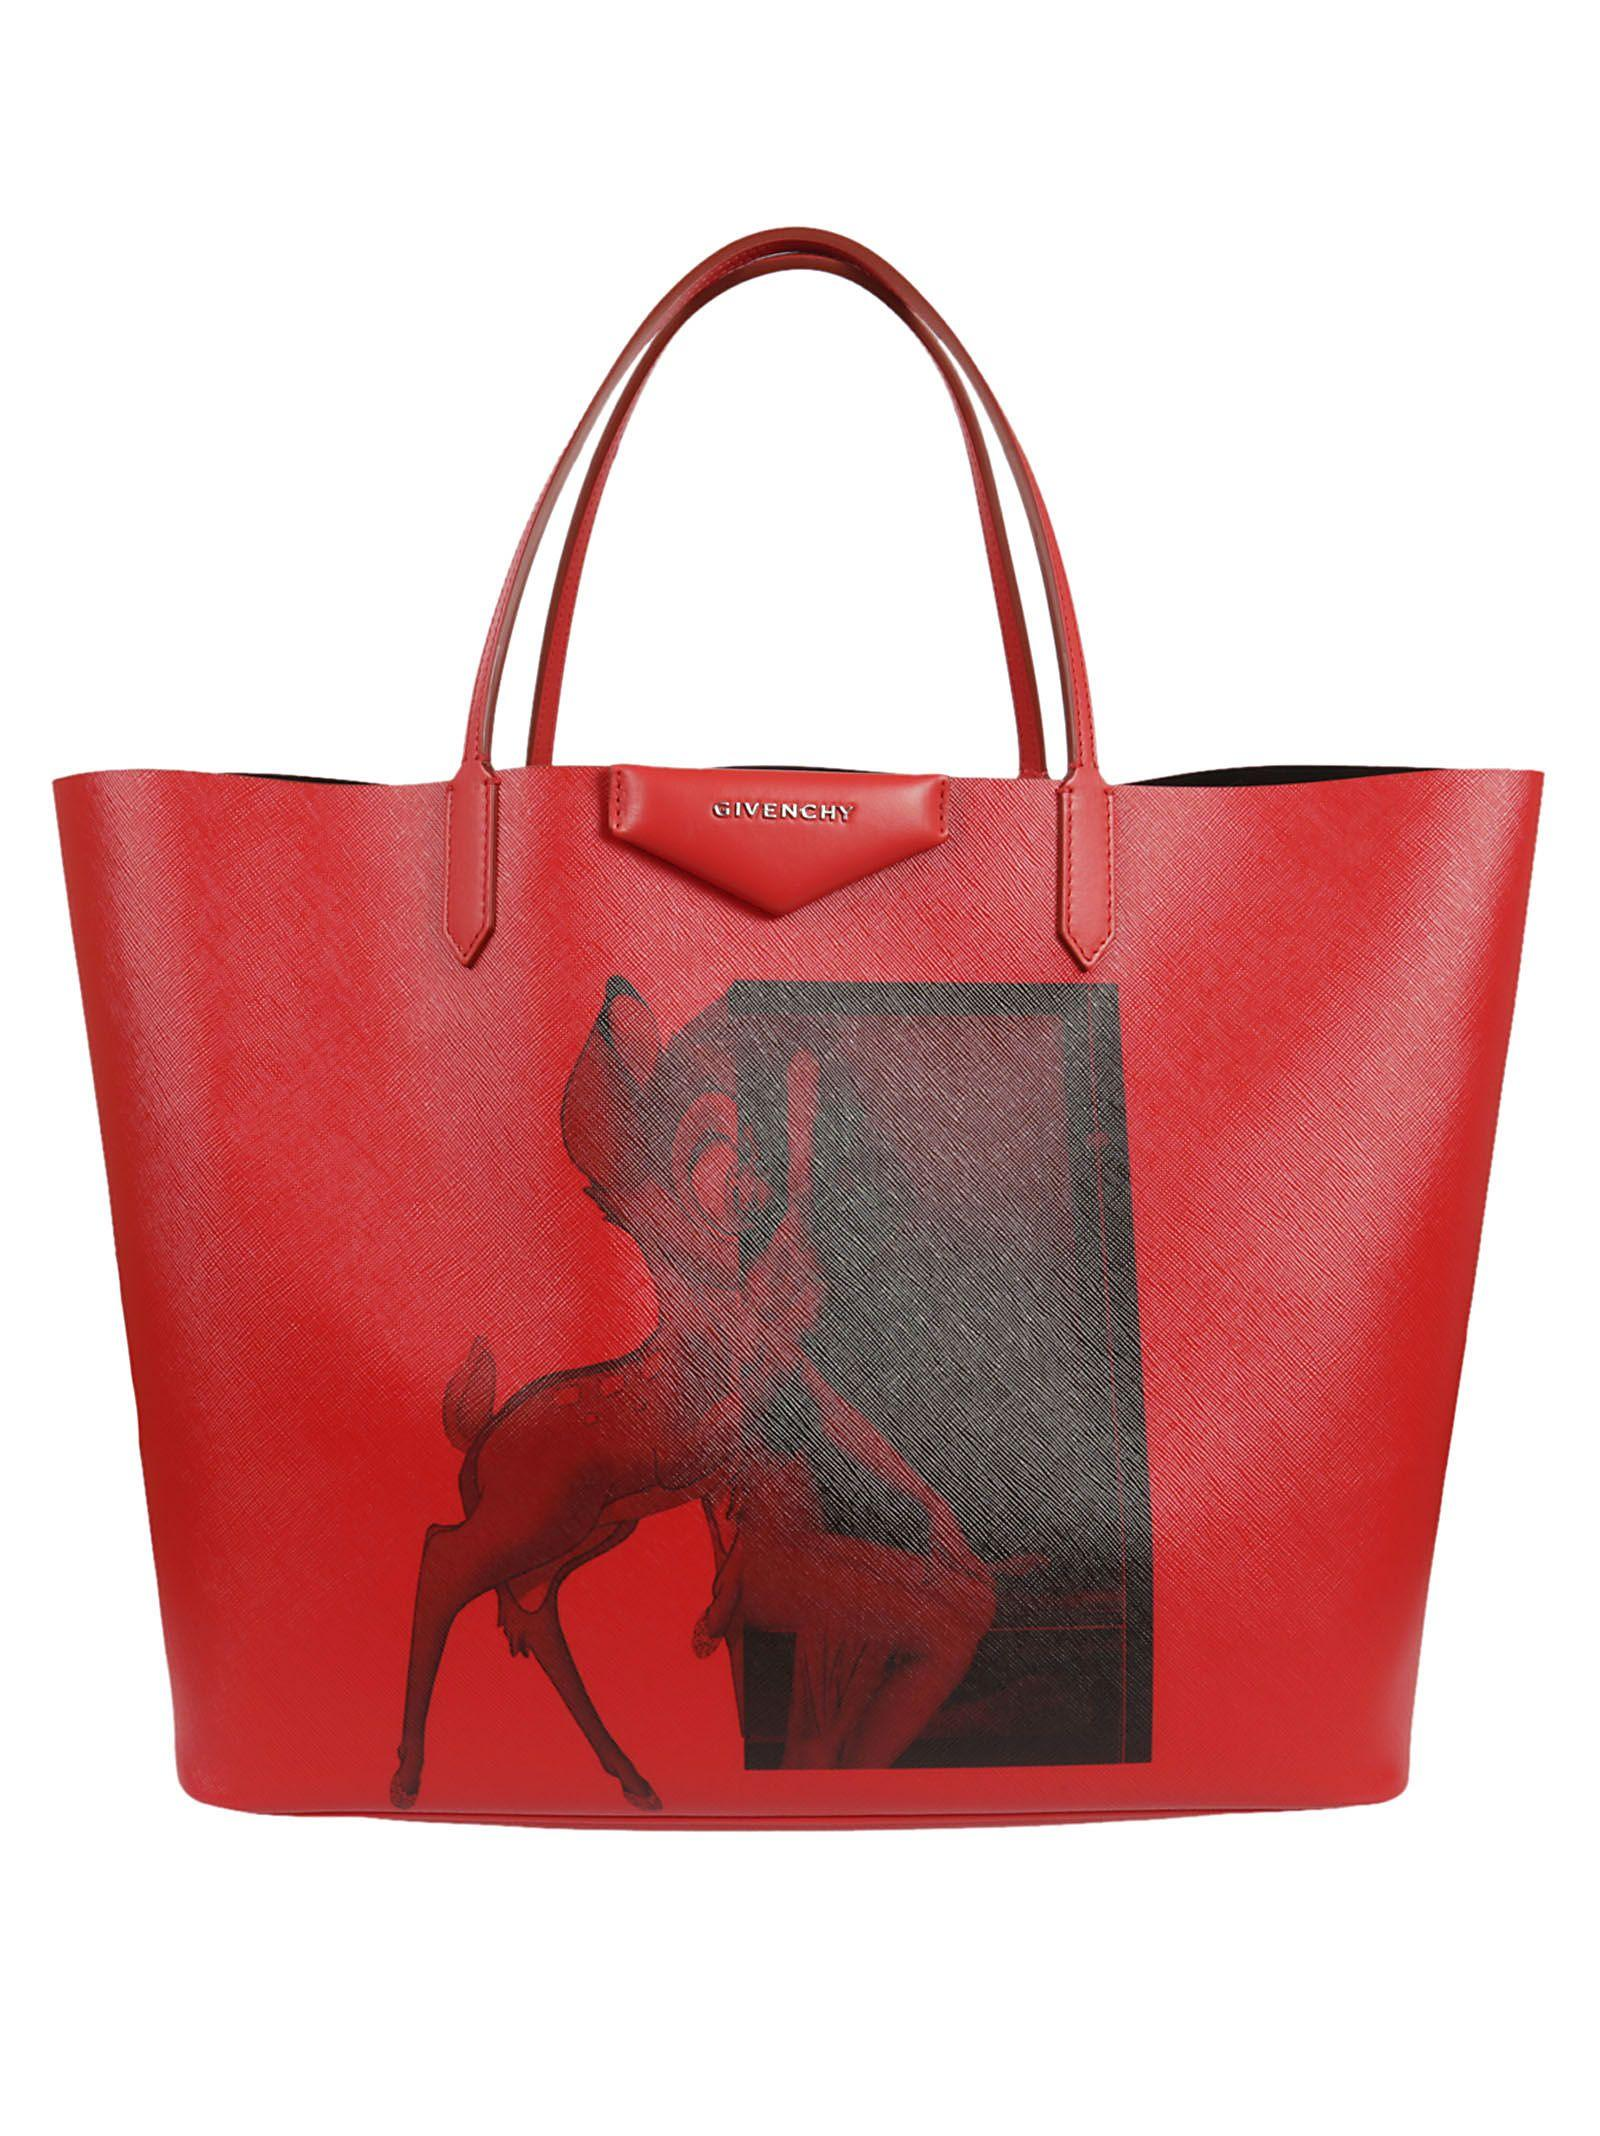 3abbcf9d2f Givenchy Antigona Coated Canvas Shopper Tote Bag